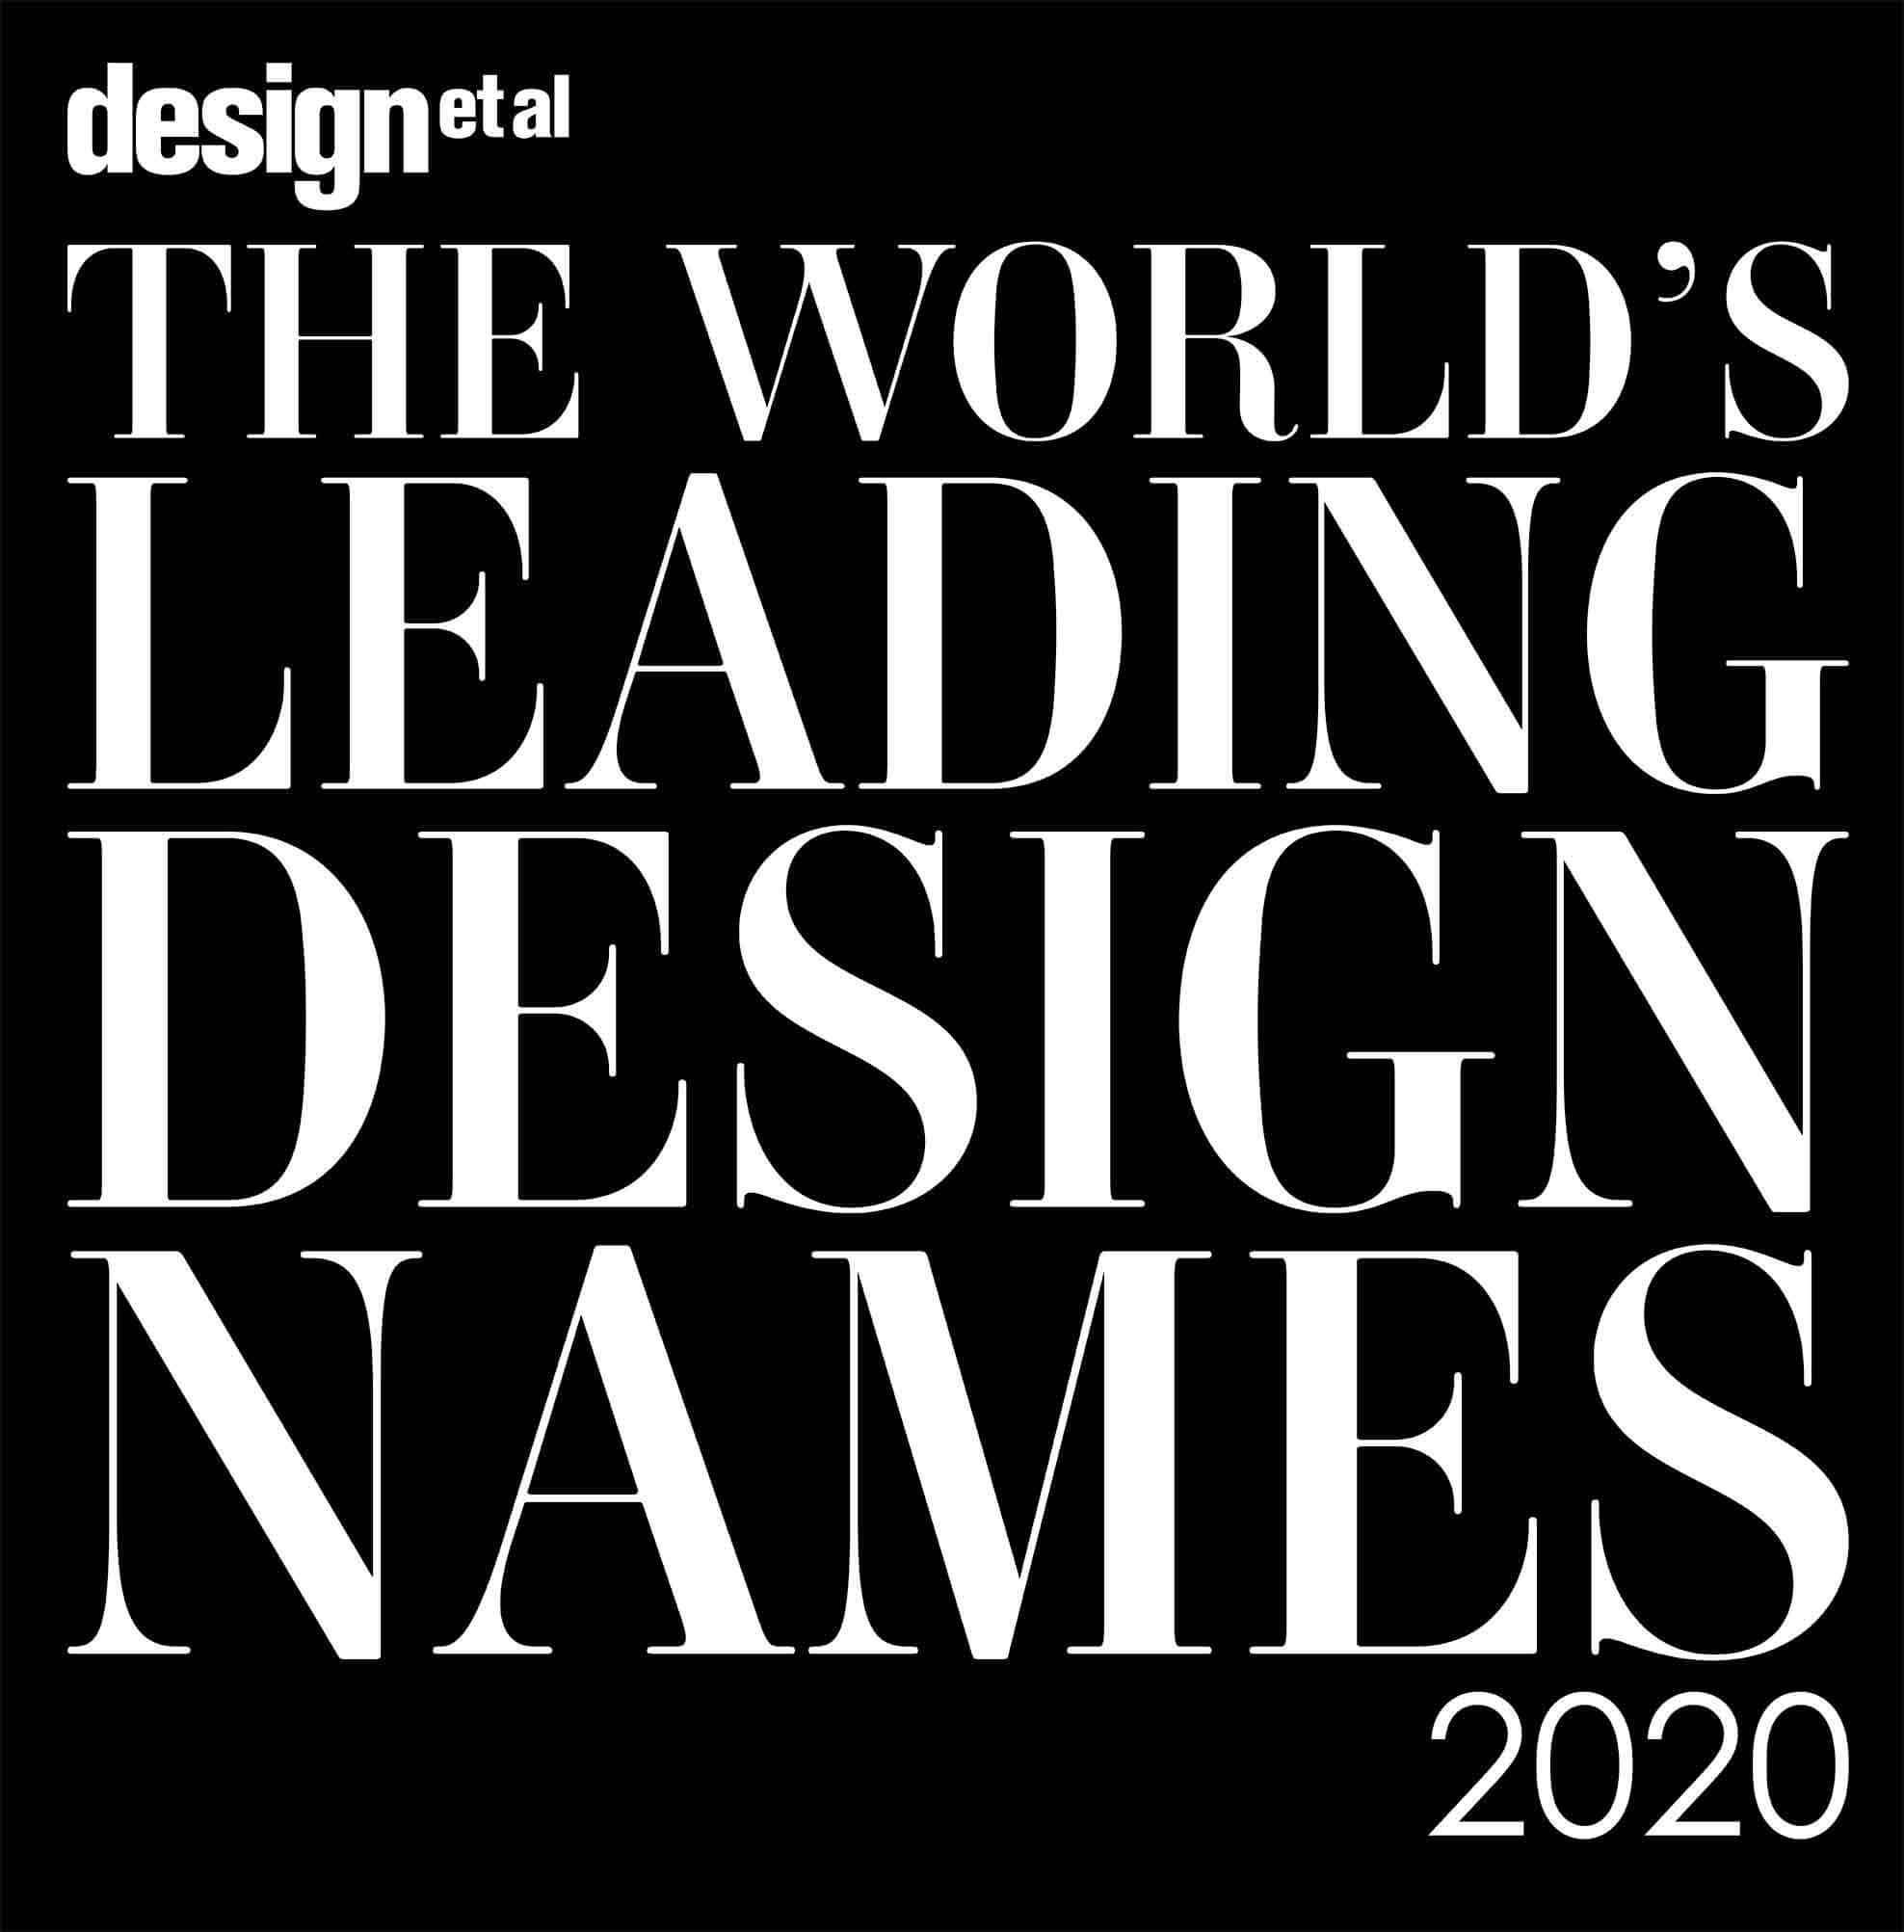 2020 Leading Design Names